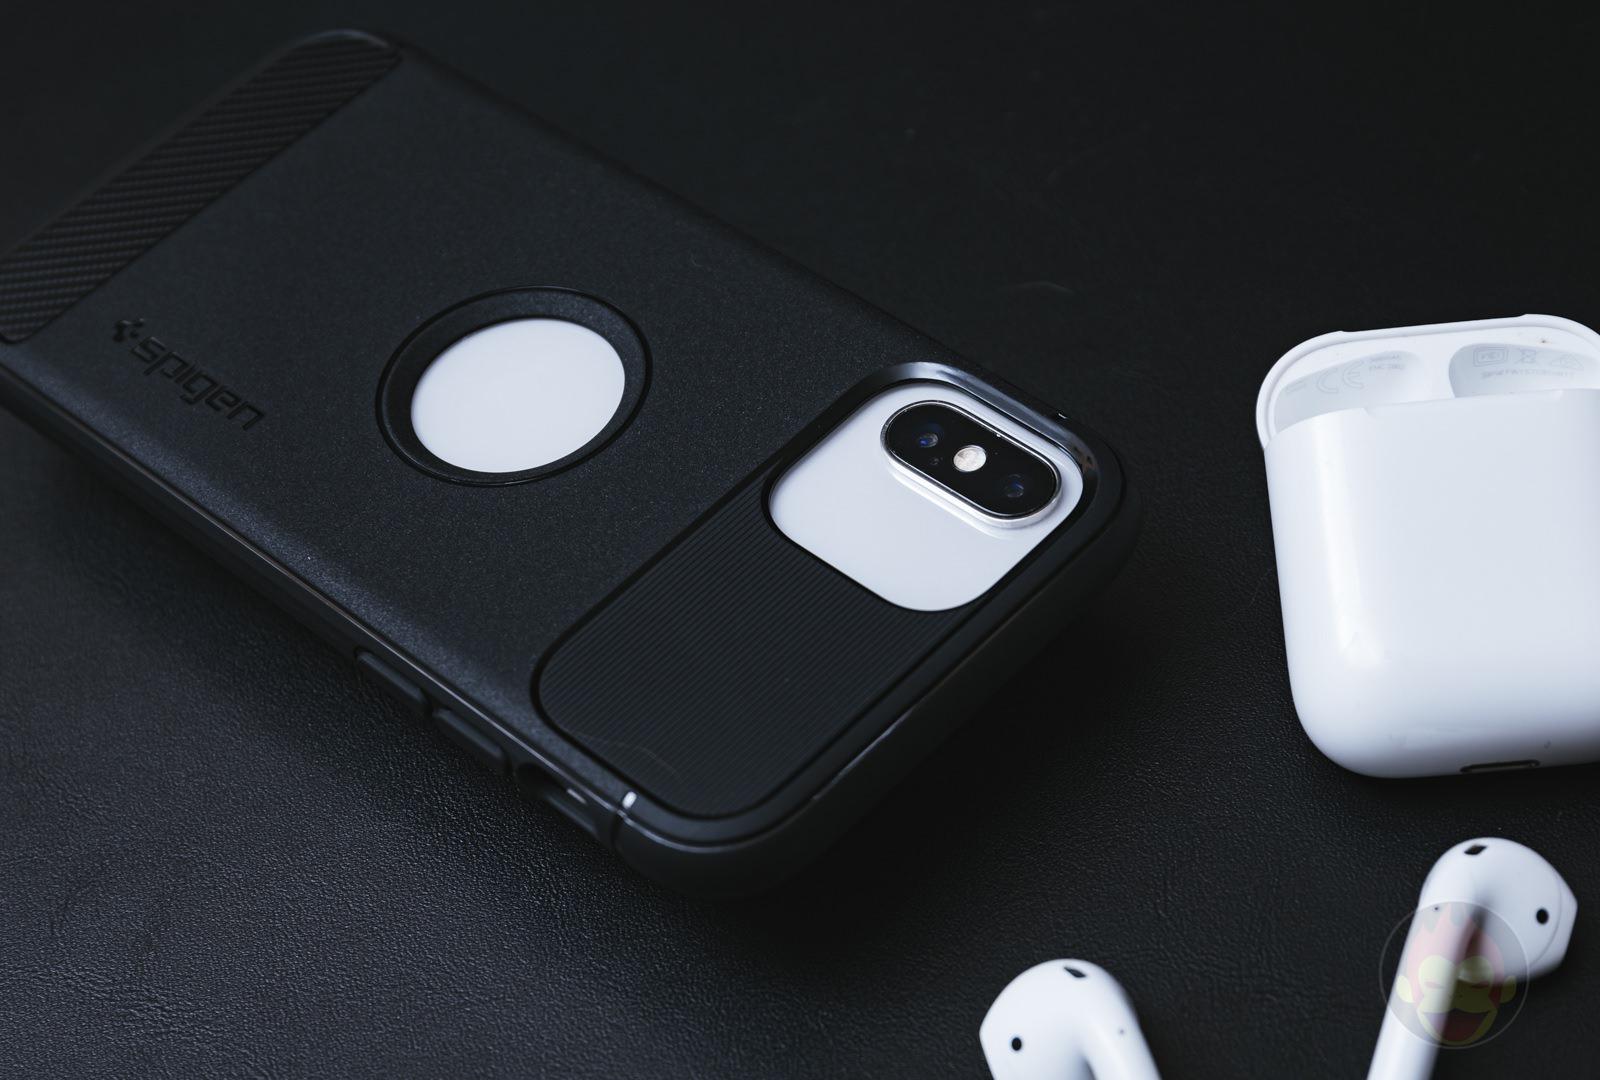 Spigen-iPhone-11-Pro-Case-Review-09.jpg